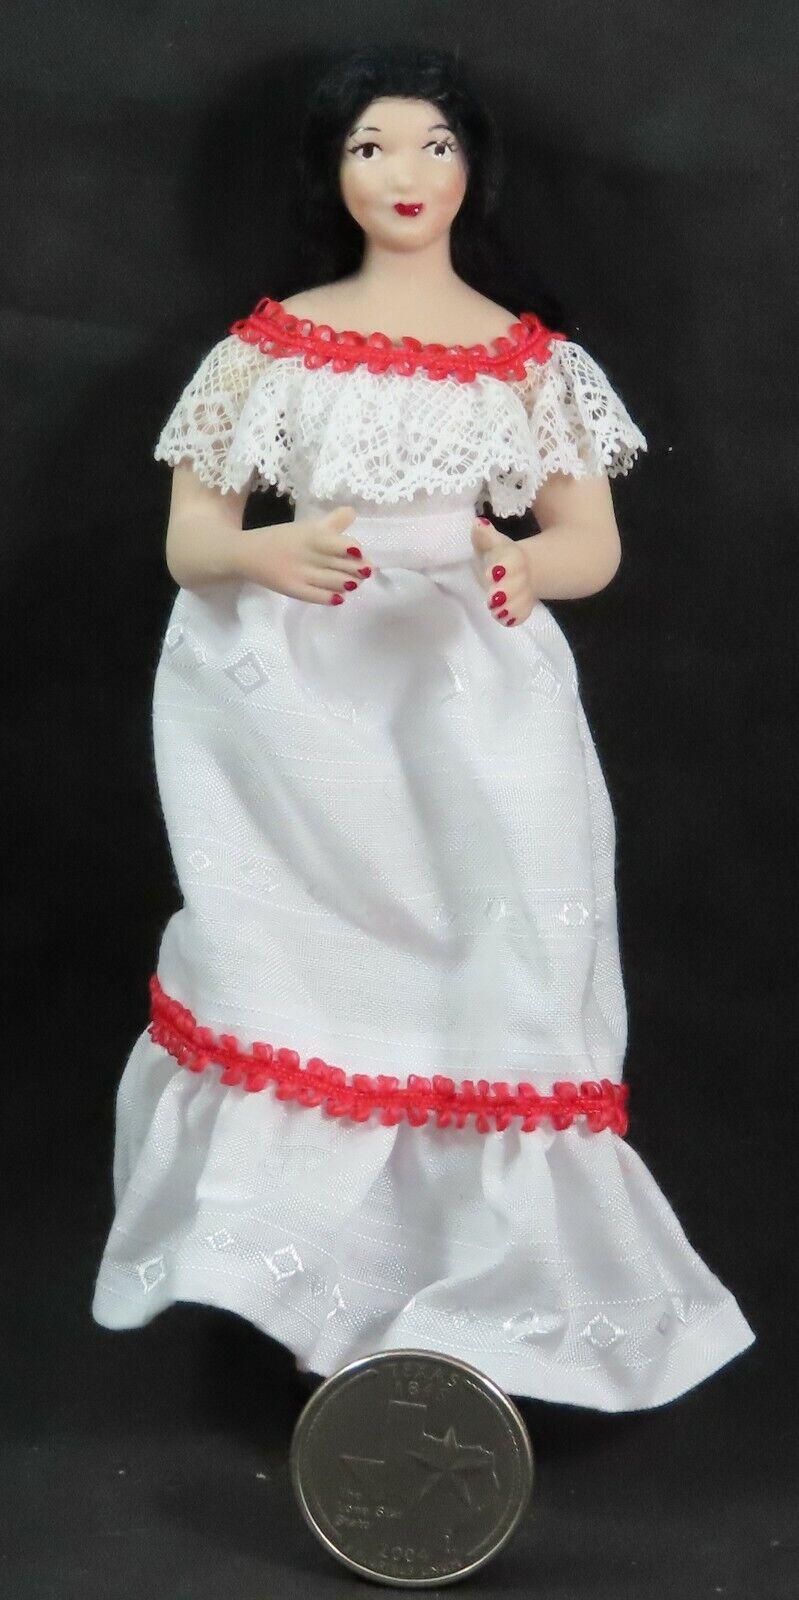 1 12 Mujer Muñeca Casa De Muñecas en Miniatura de cerámica hispano mexicana  4971 Thomas